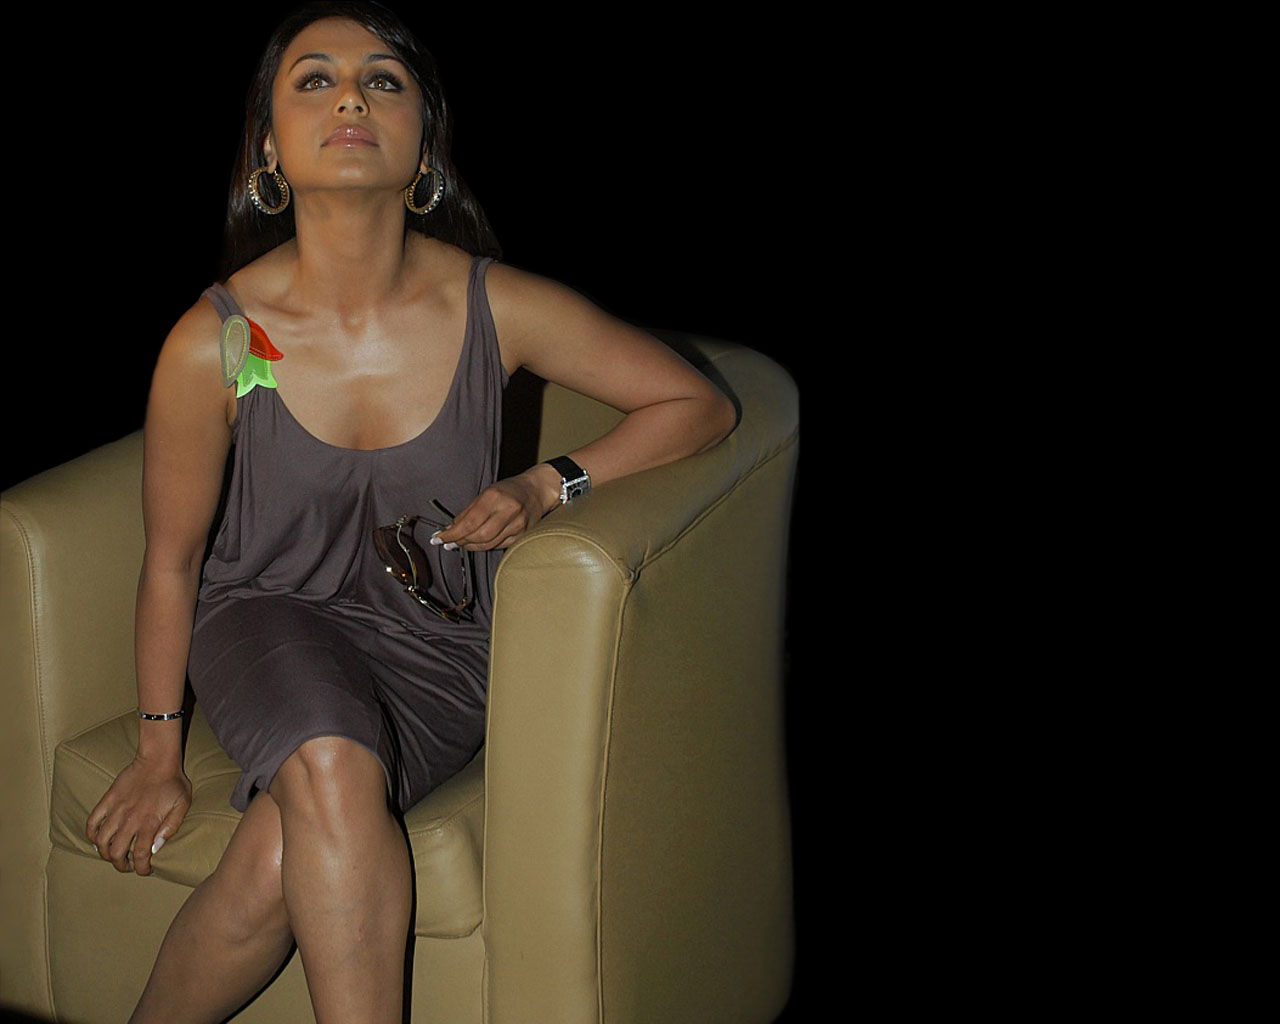 http://2.bp.blogspot.com/-cZtb9GInuNw/TjQElVo2JAI/AAAAAAAAAO8/hMTa_ny5zUo/s1600/Rani+Mukherjee+sexy+images.jpg